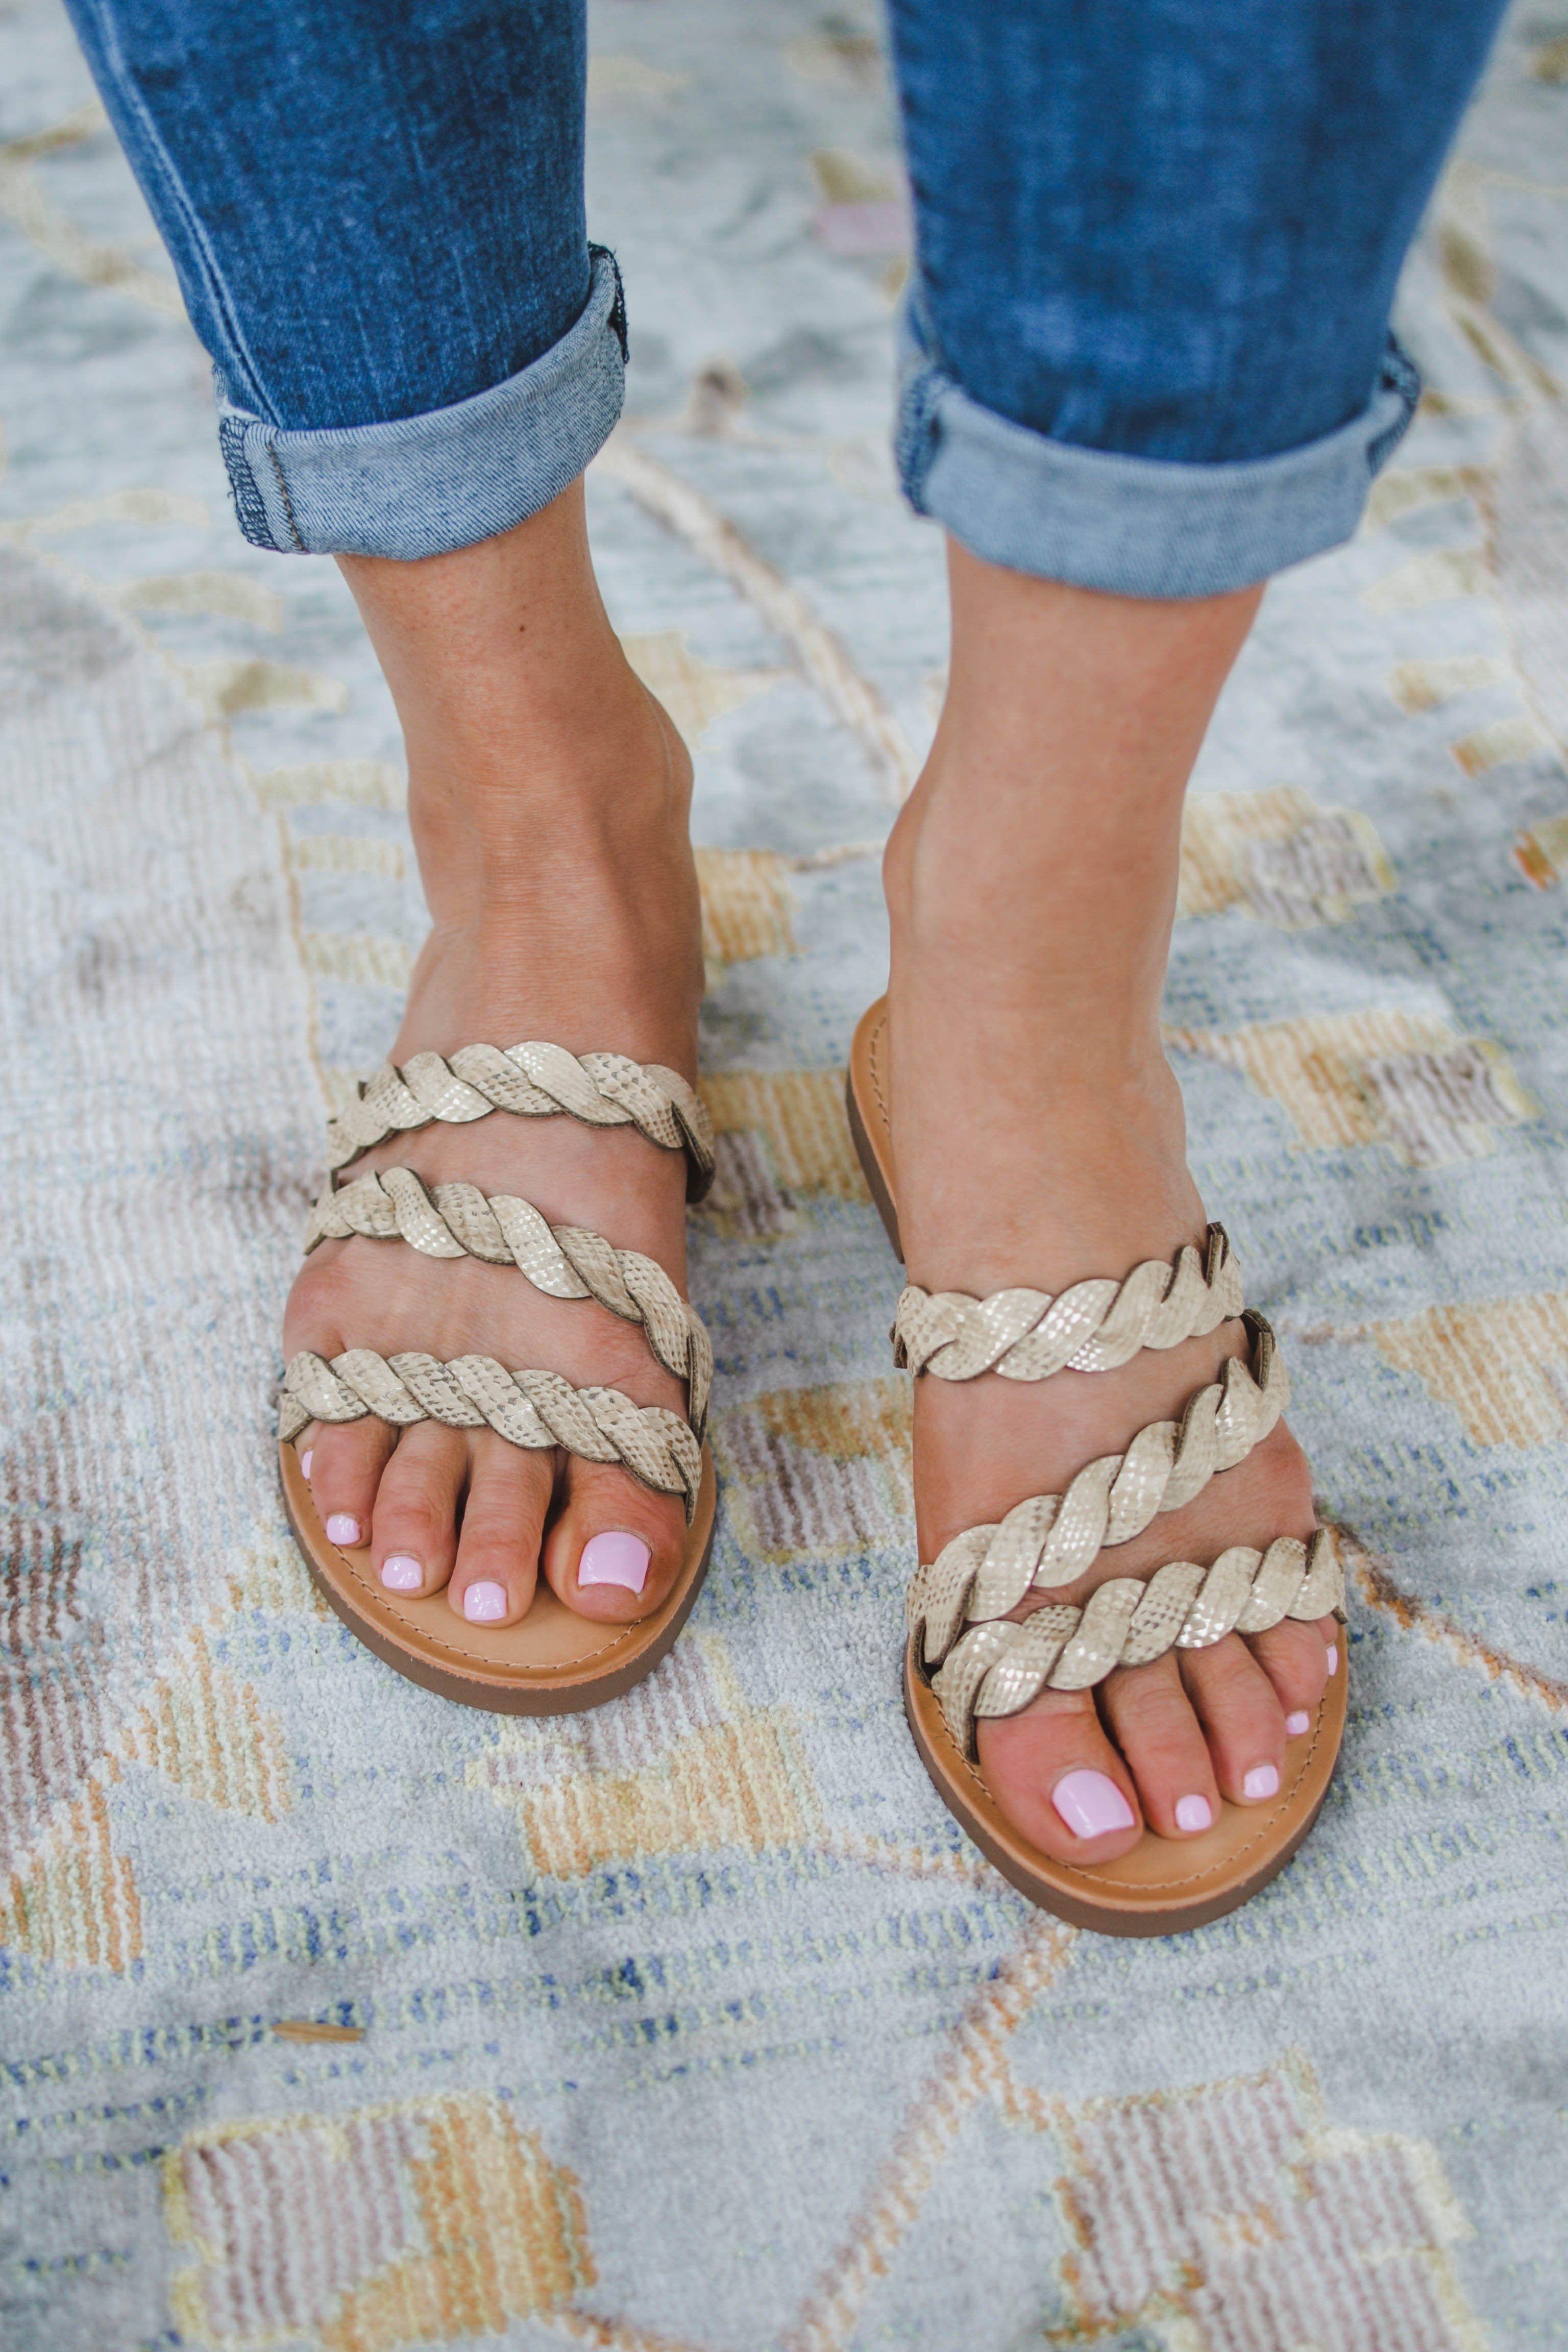 8c0c0b19c73 Shop Pomp and Circumstance Boutique! Braided Snake Sandal  Sizes 5.5-10.  Ladies